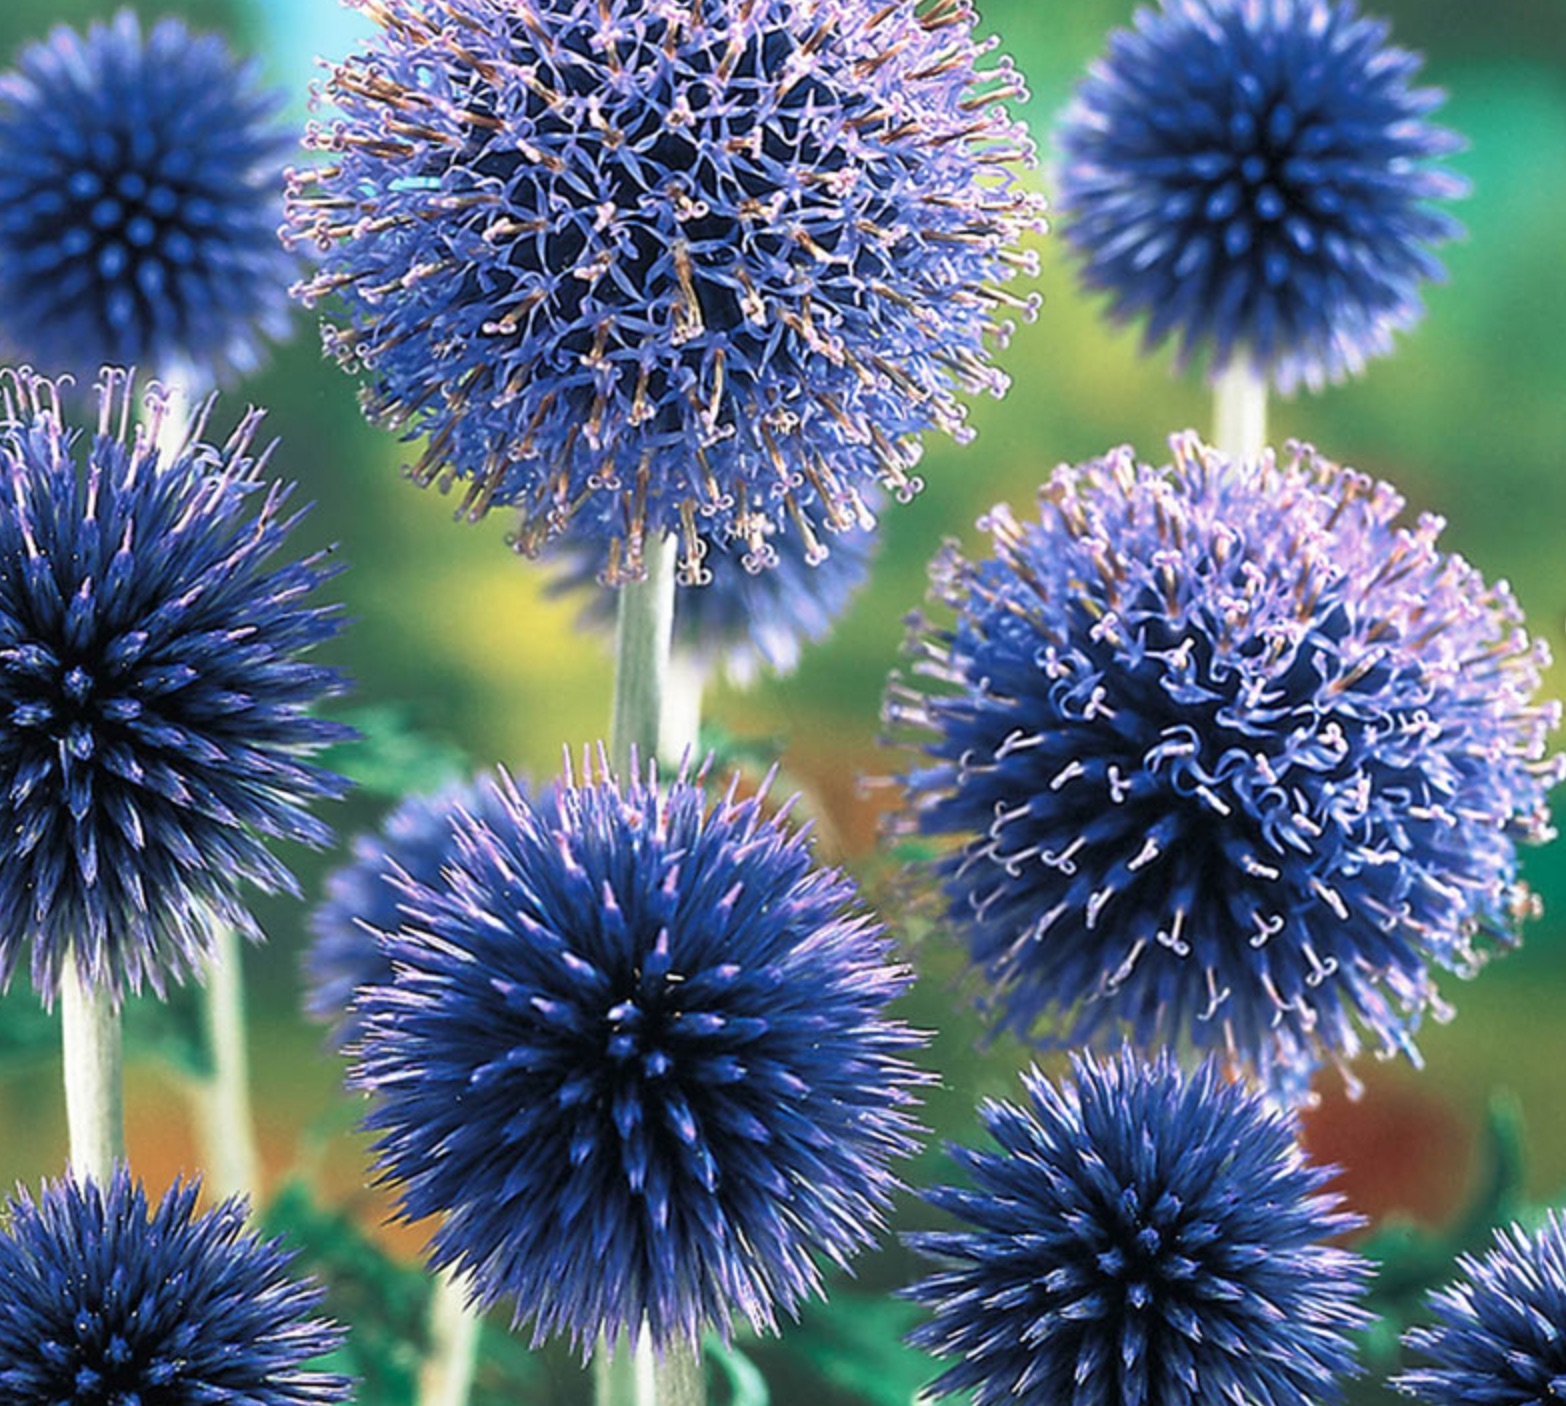 Best Blue Plants for the Garden Veitch's Blue Globe Thistle #Garden #Plants #Gardening #PlantswithBlueFlowers #PlantswithBlueBlooms #BluePlants #DramaticFoliagePlants